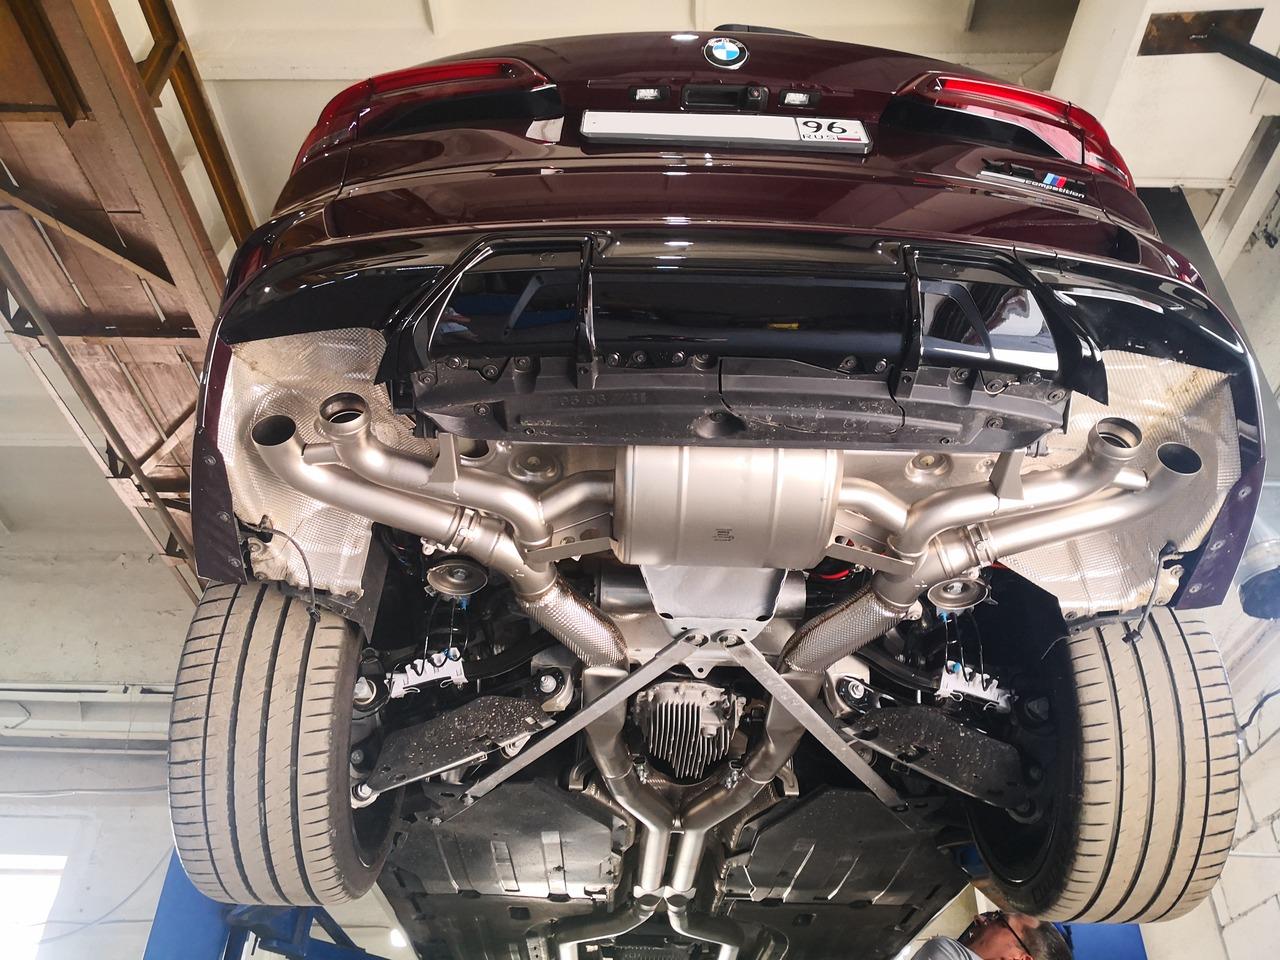 Установленный выхлоп Akrapovic, дооснащение BMW F95 X5M